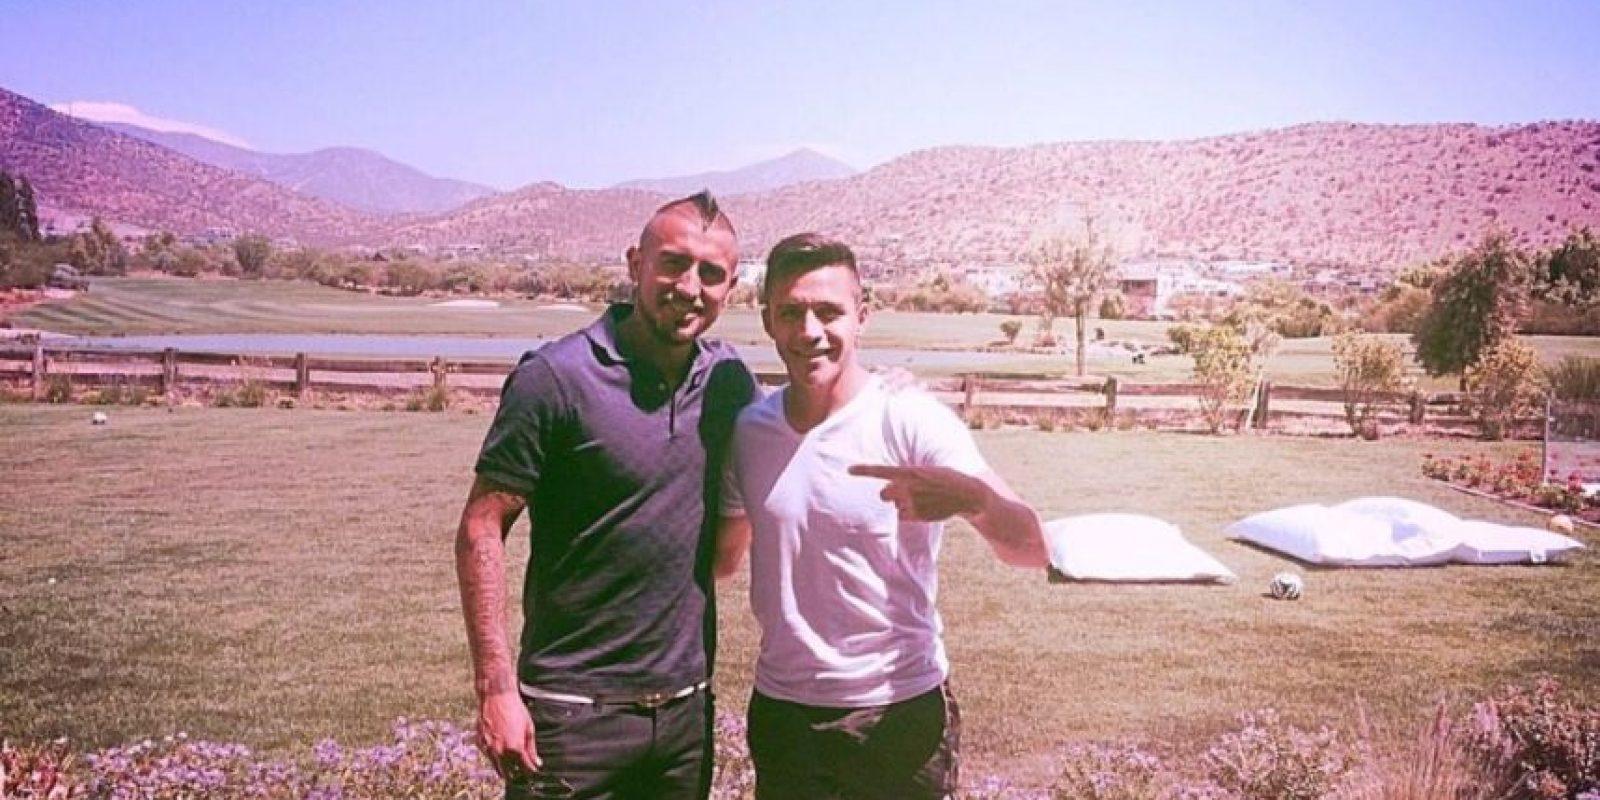 Arturo Vidal y Alexis Sánchez. Foto:twitter.com/Alexis_Sanchez